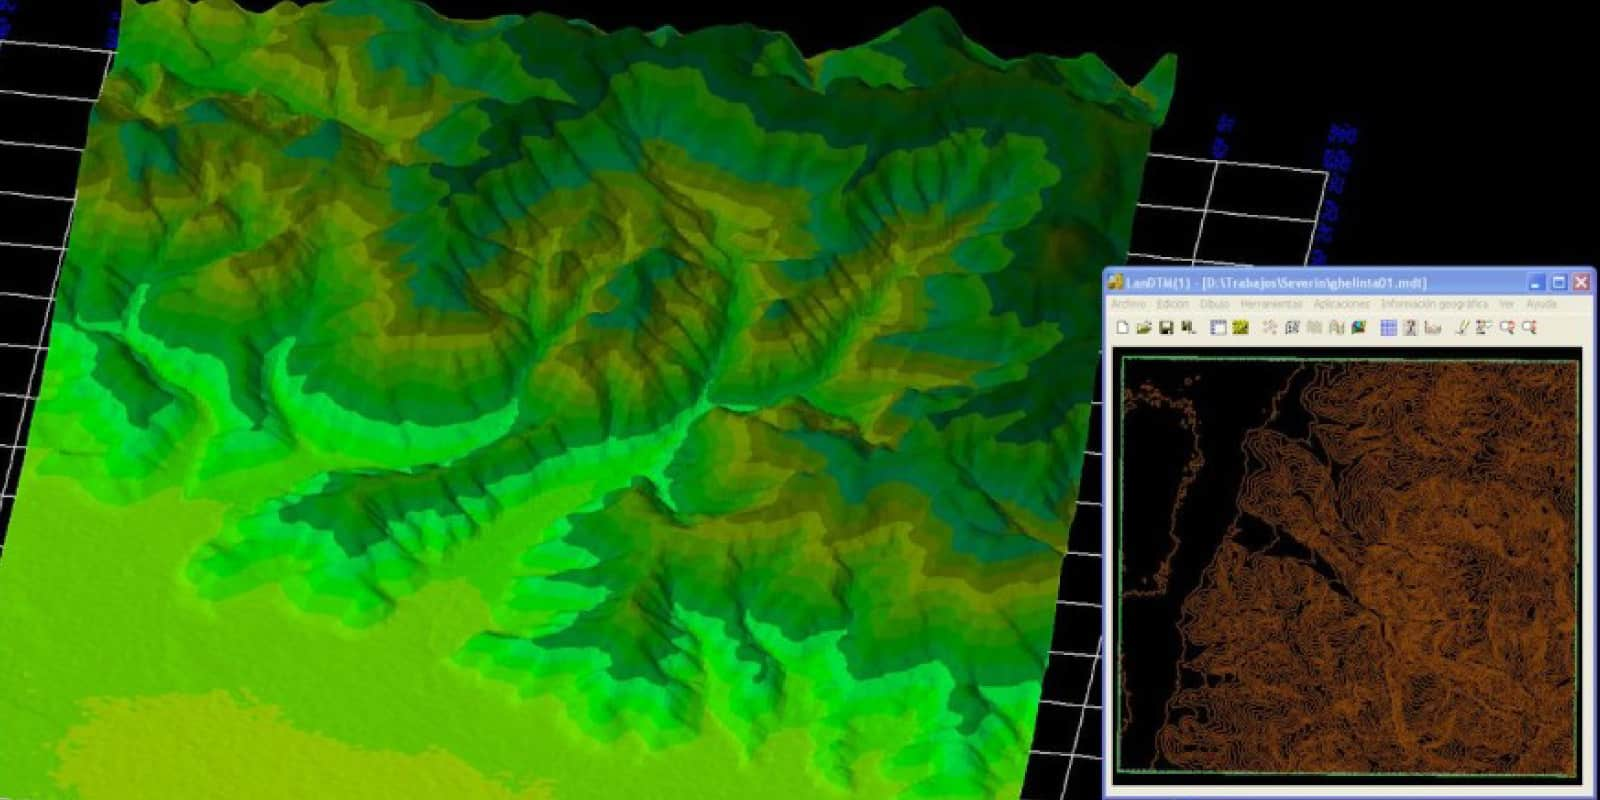 Modelo digital del terreno en Protopo